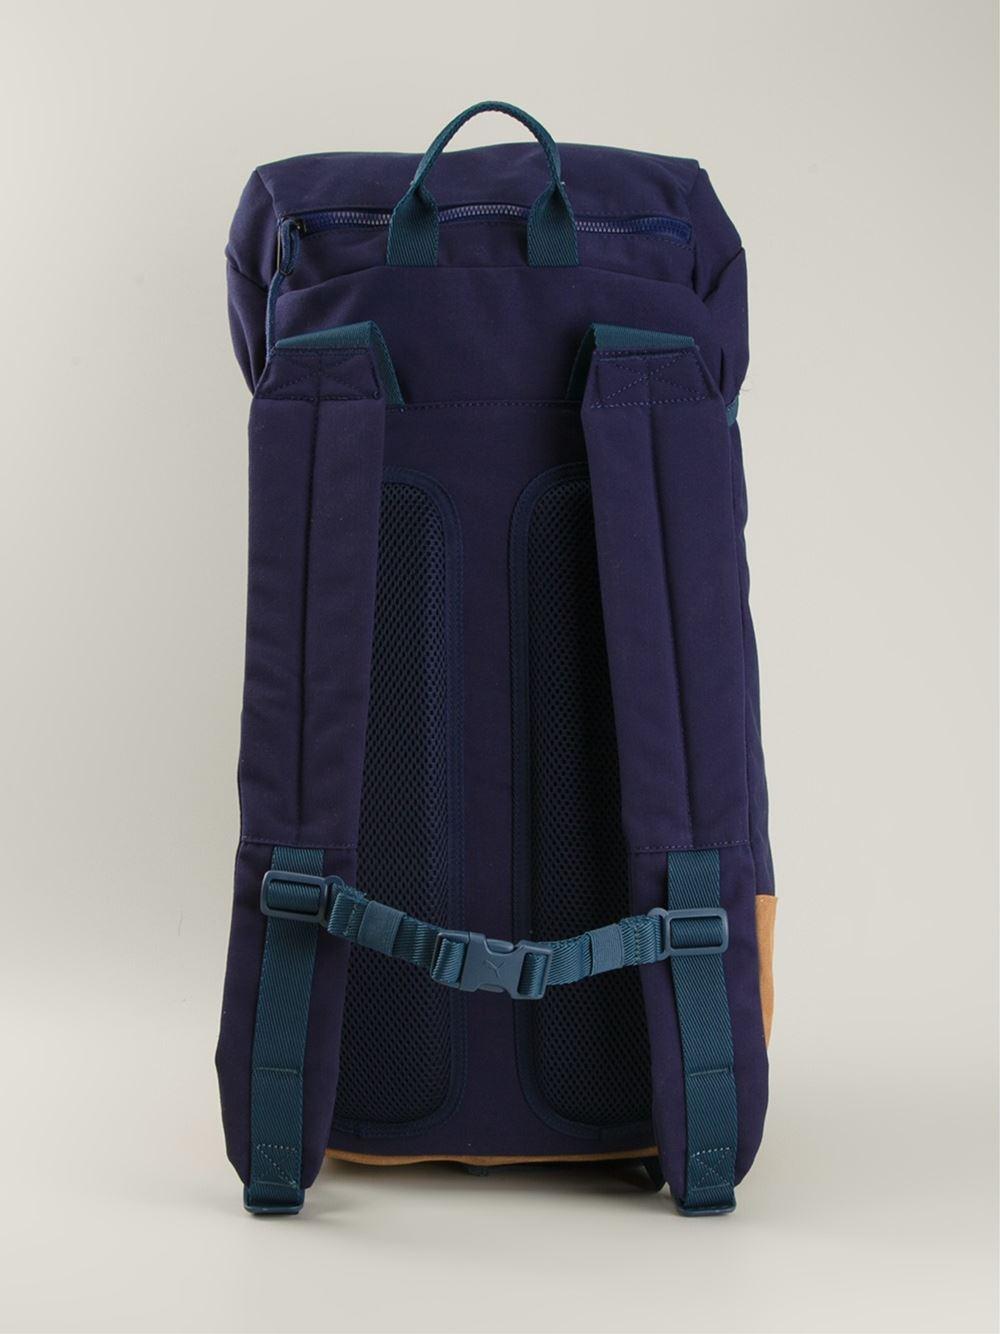 Lyst Puma Bwgh Backpack In Blue For Men